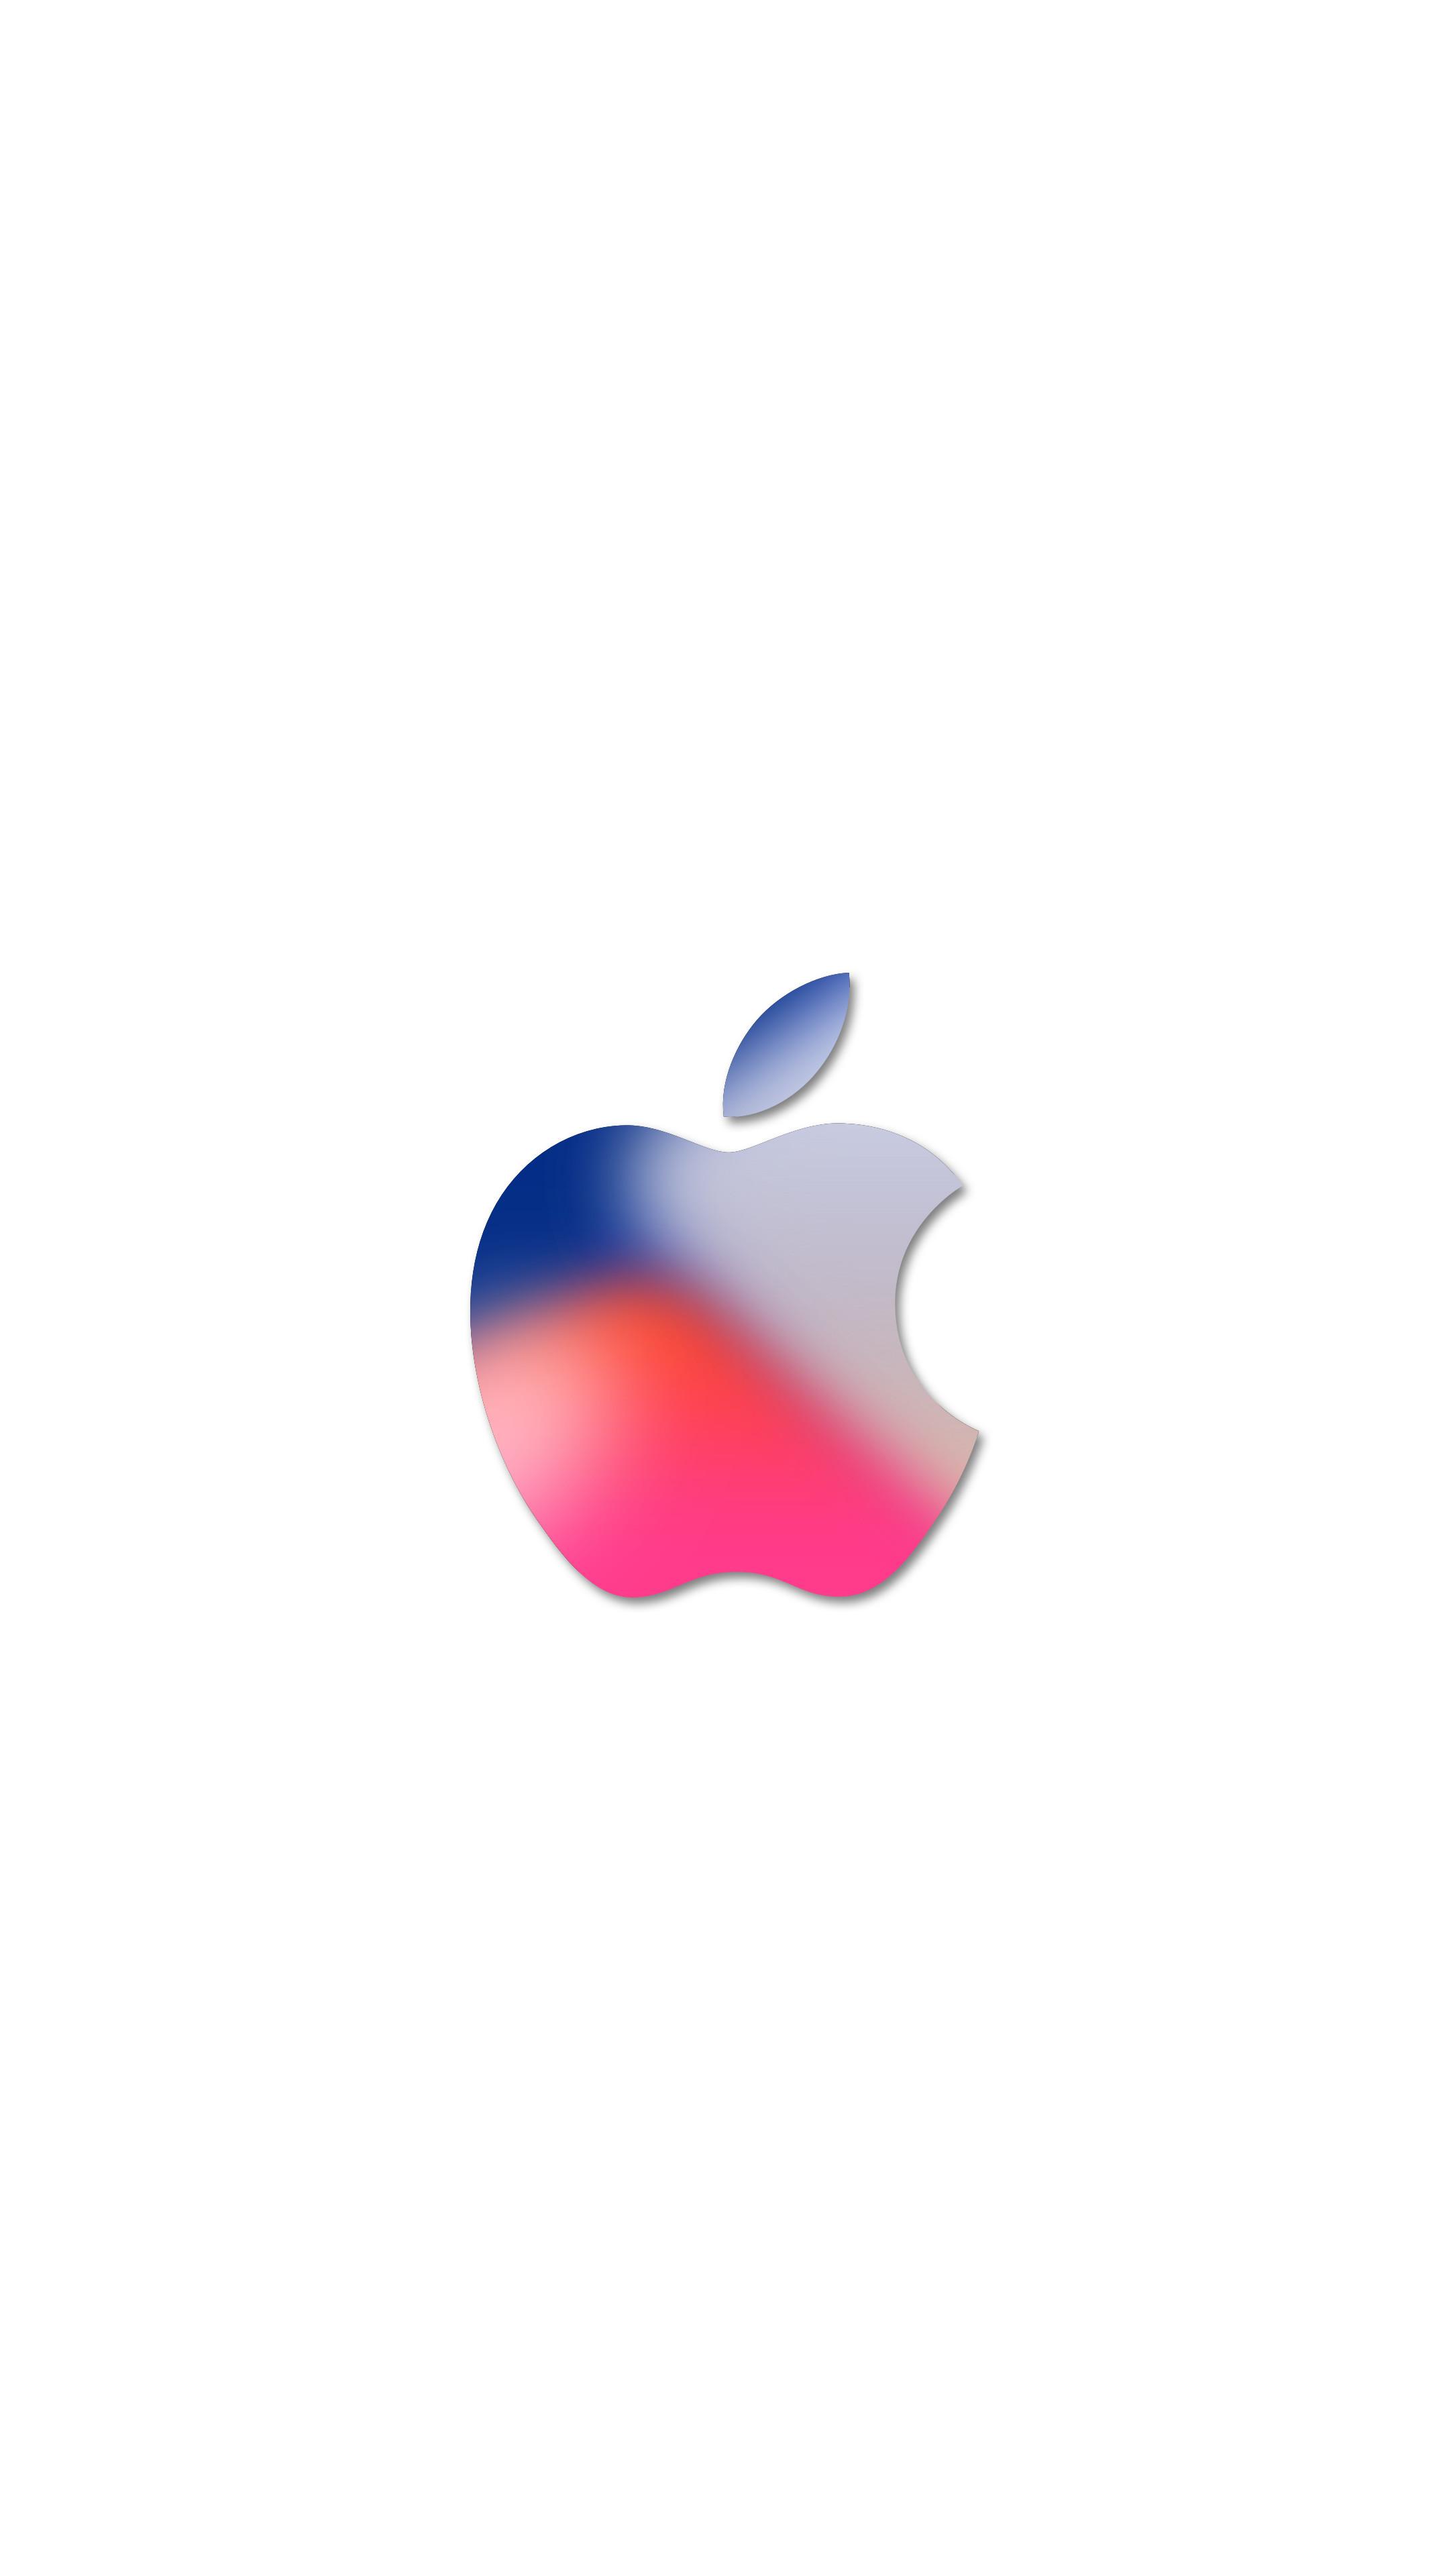 White Apple Logo Wallpaper - Novocom.top